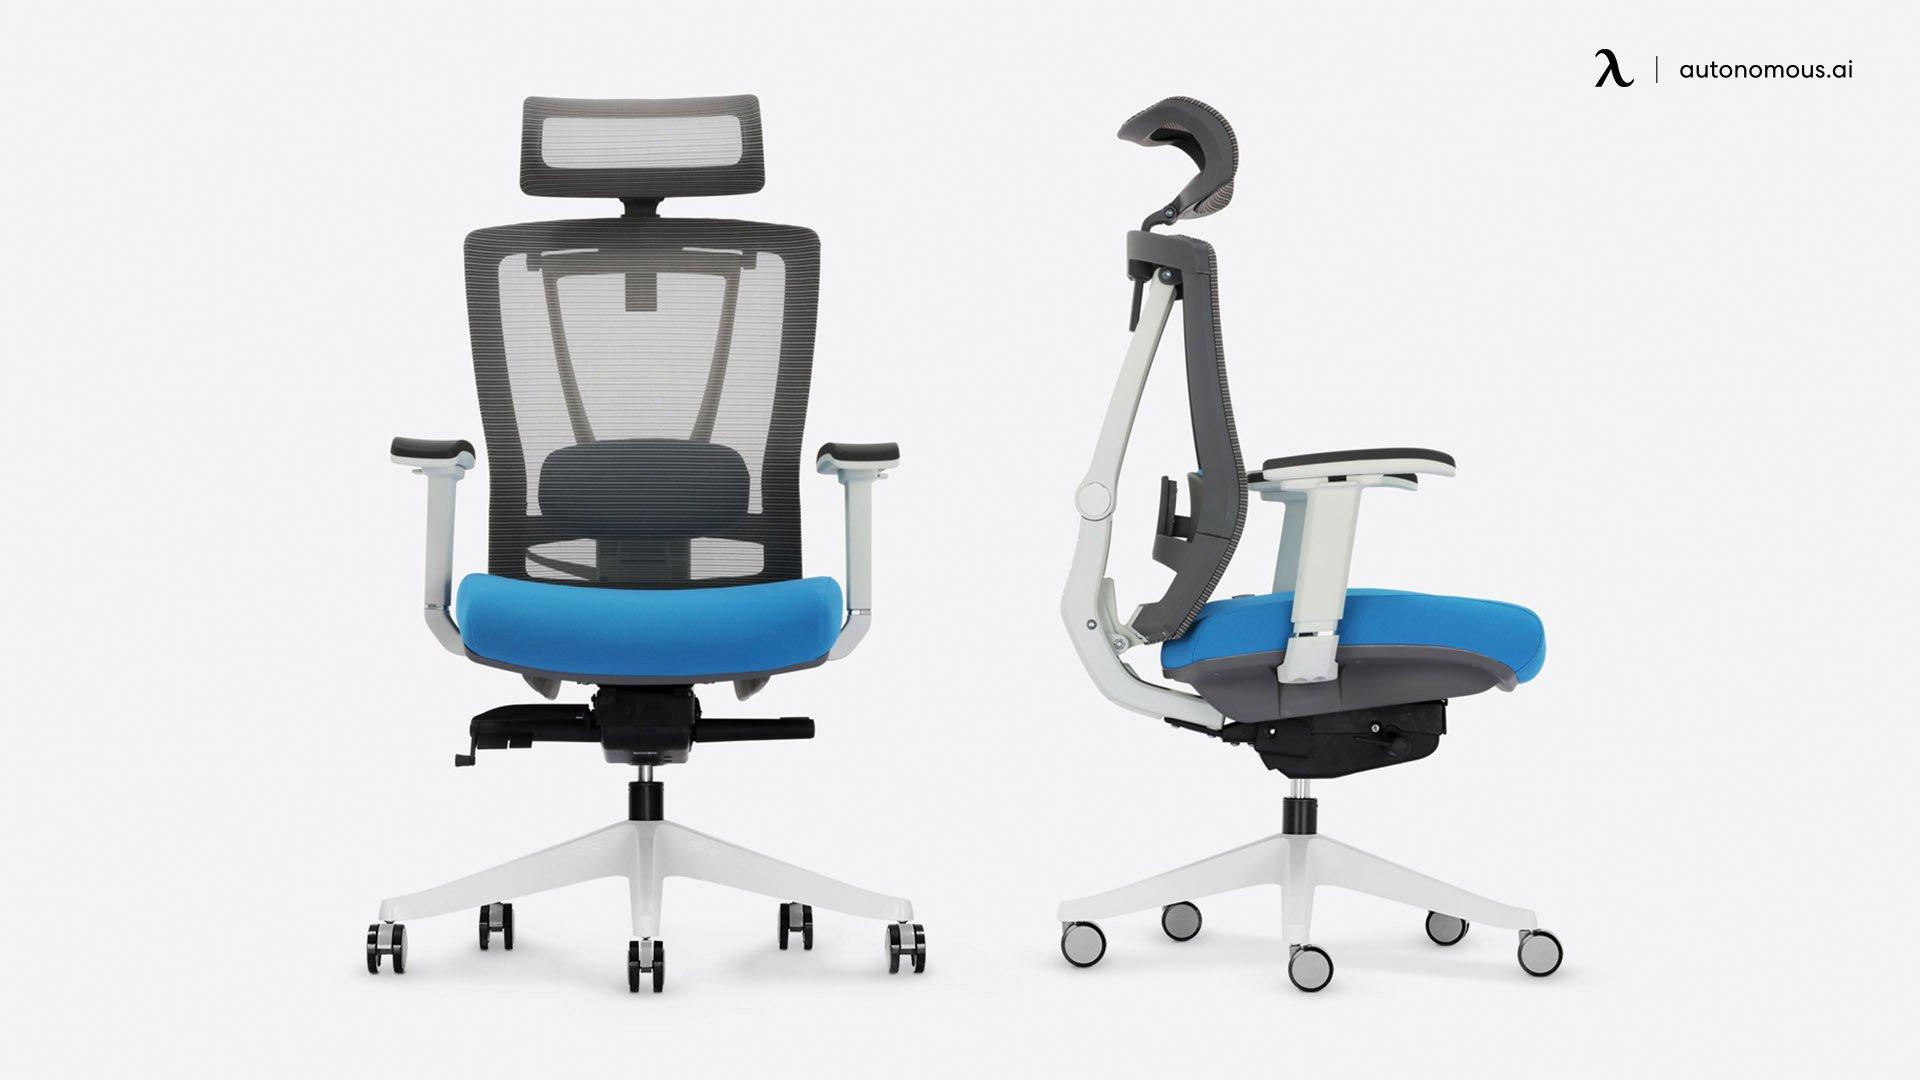 Autonomous ErgoChair 2 Ergonomic Chair